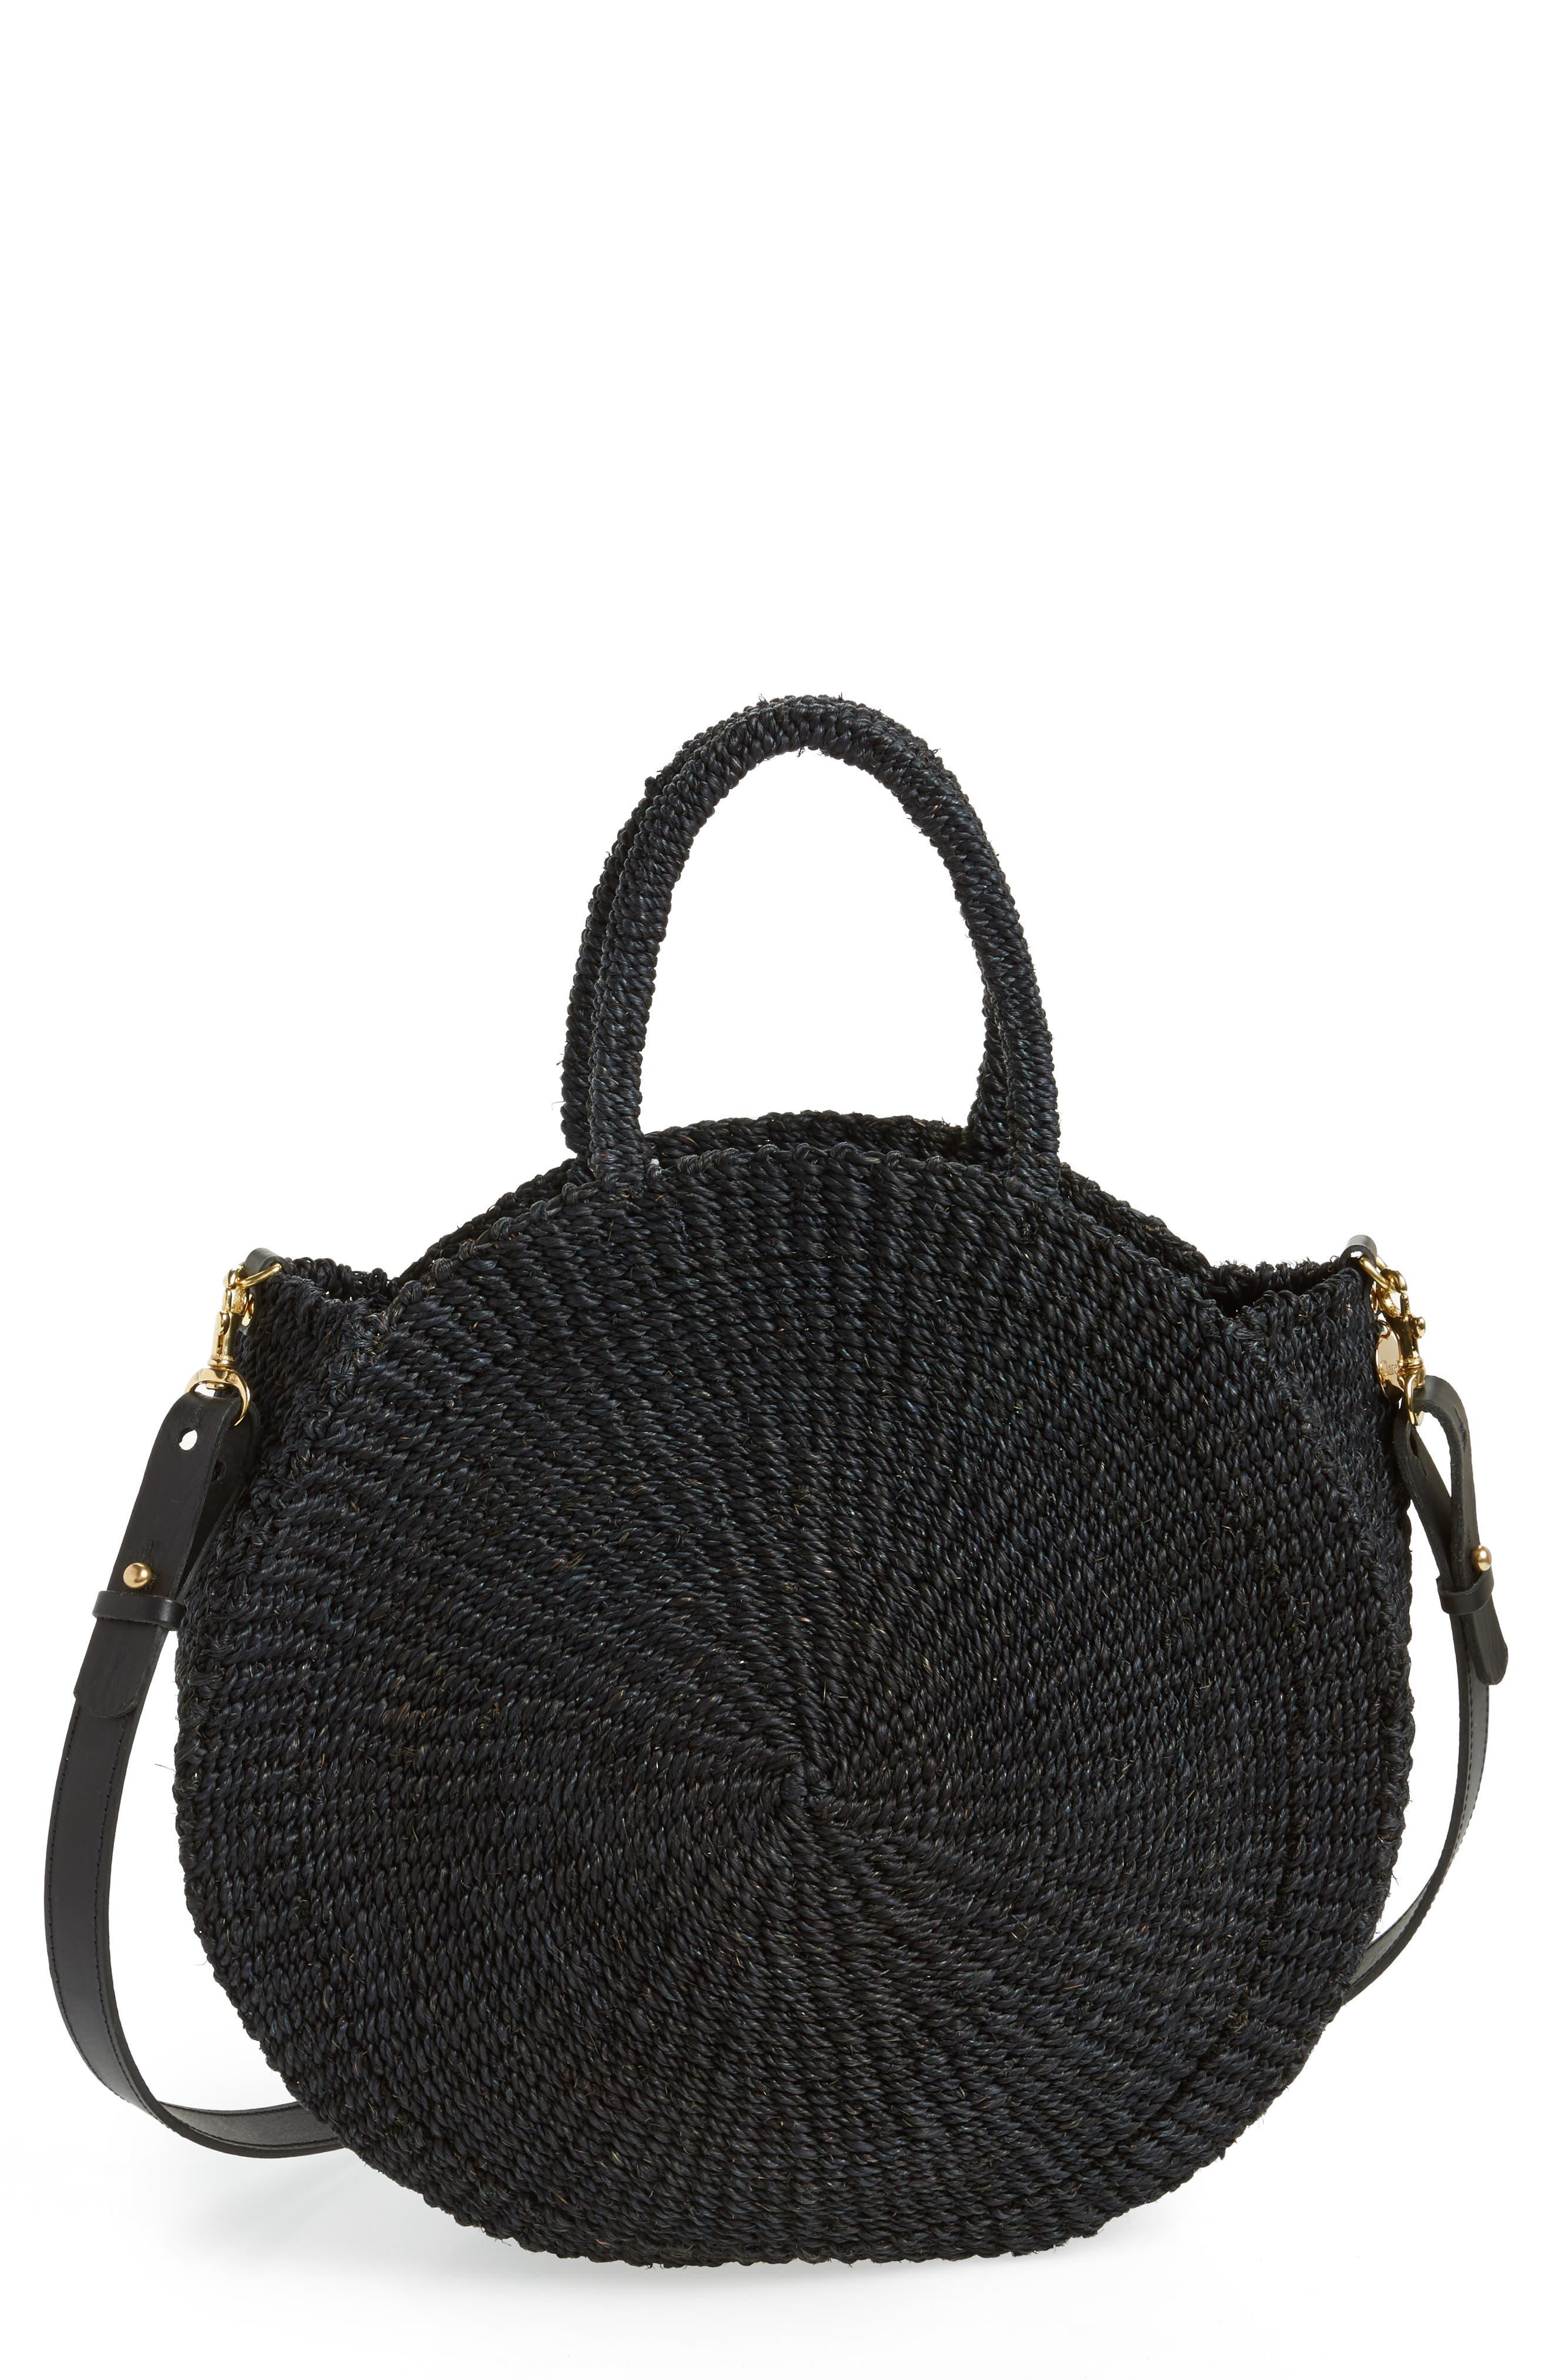 Alternate Image 1 Selected - Clare V. Alice Woven Sisal Straw Bag